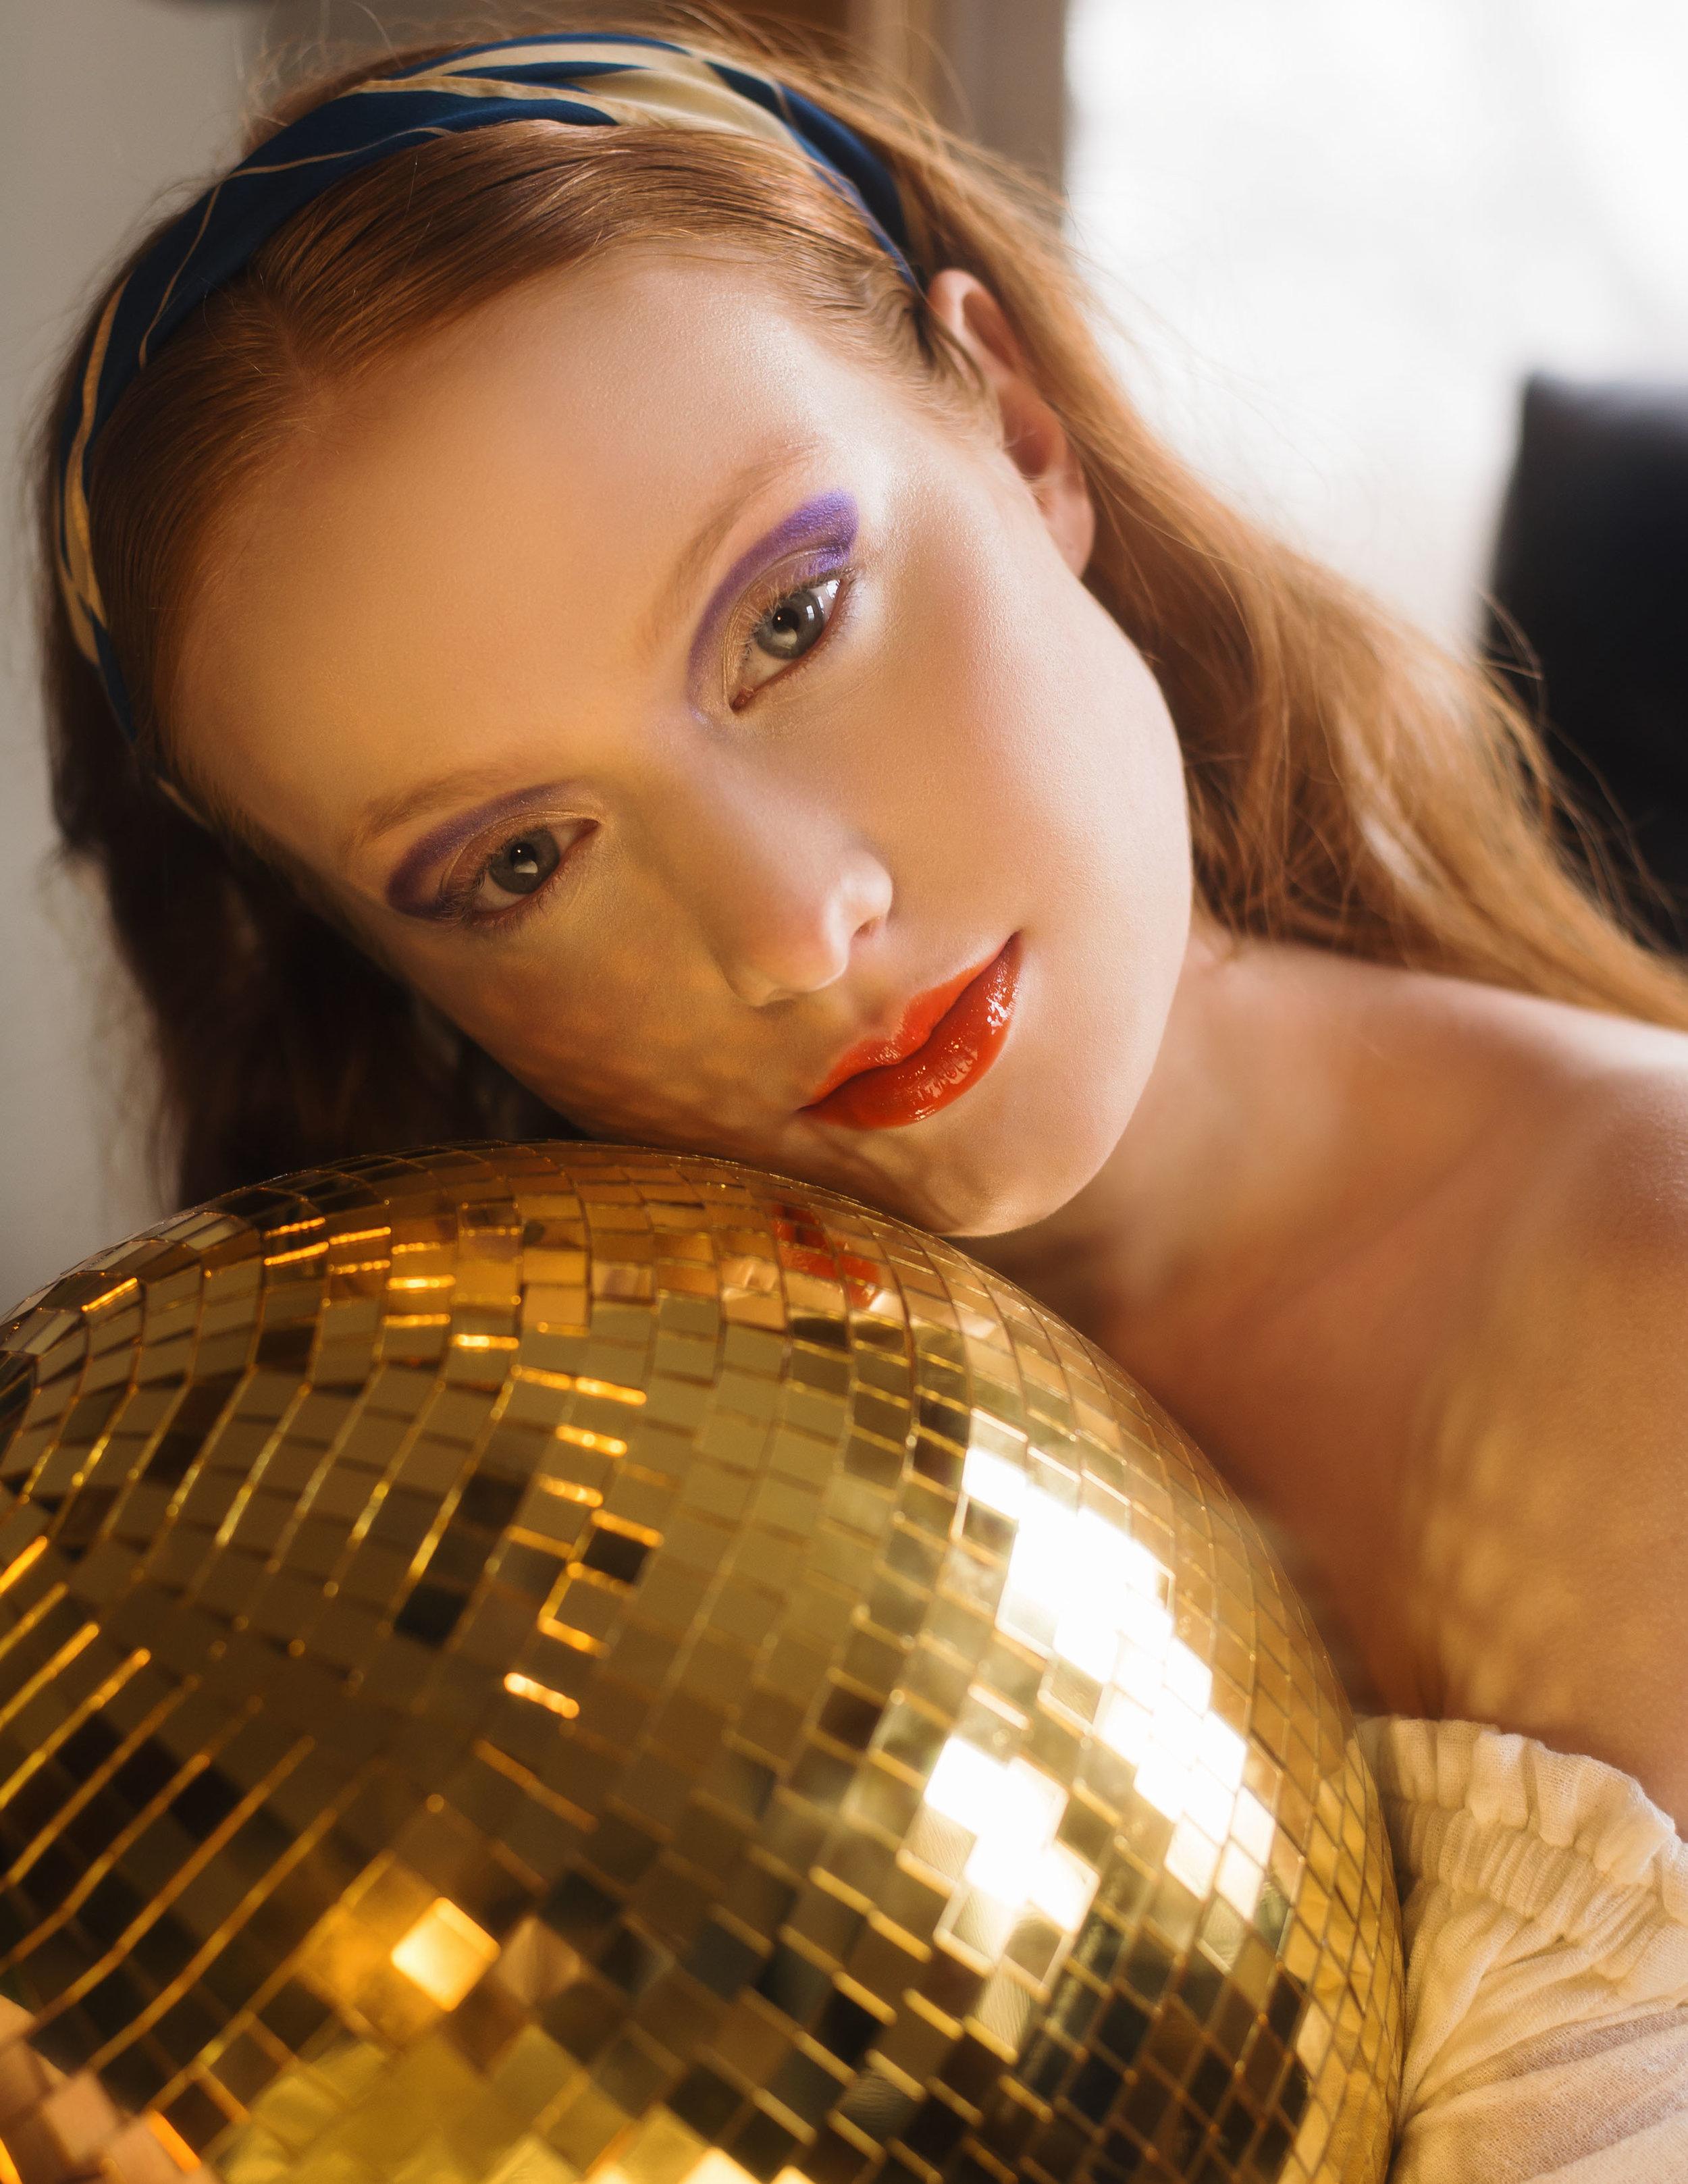 Model: Rebecca  Agency: Ford Models  Makeup & Art Direction: Erica Janssen  Hair: Ania Lisikiewicz  Photographer: Colleen Carney  Stylist: Francesca Gabrielle